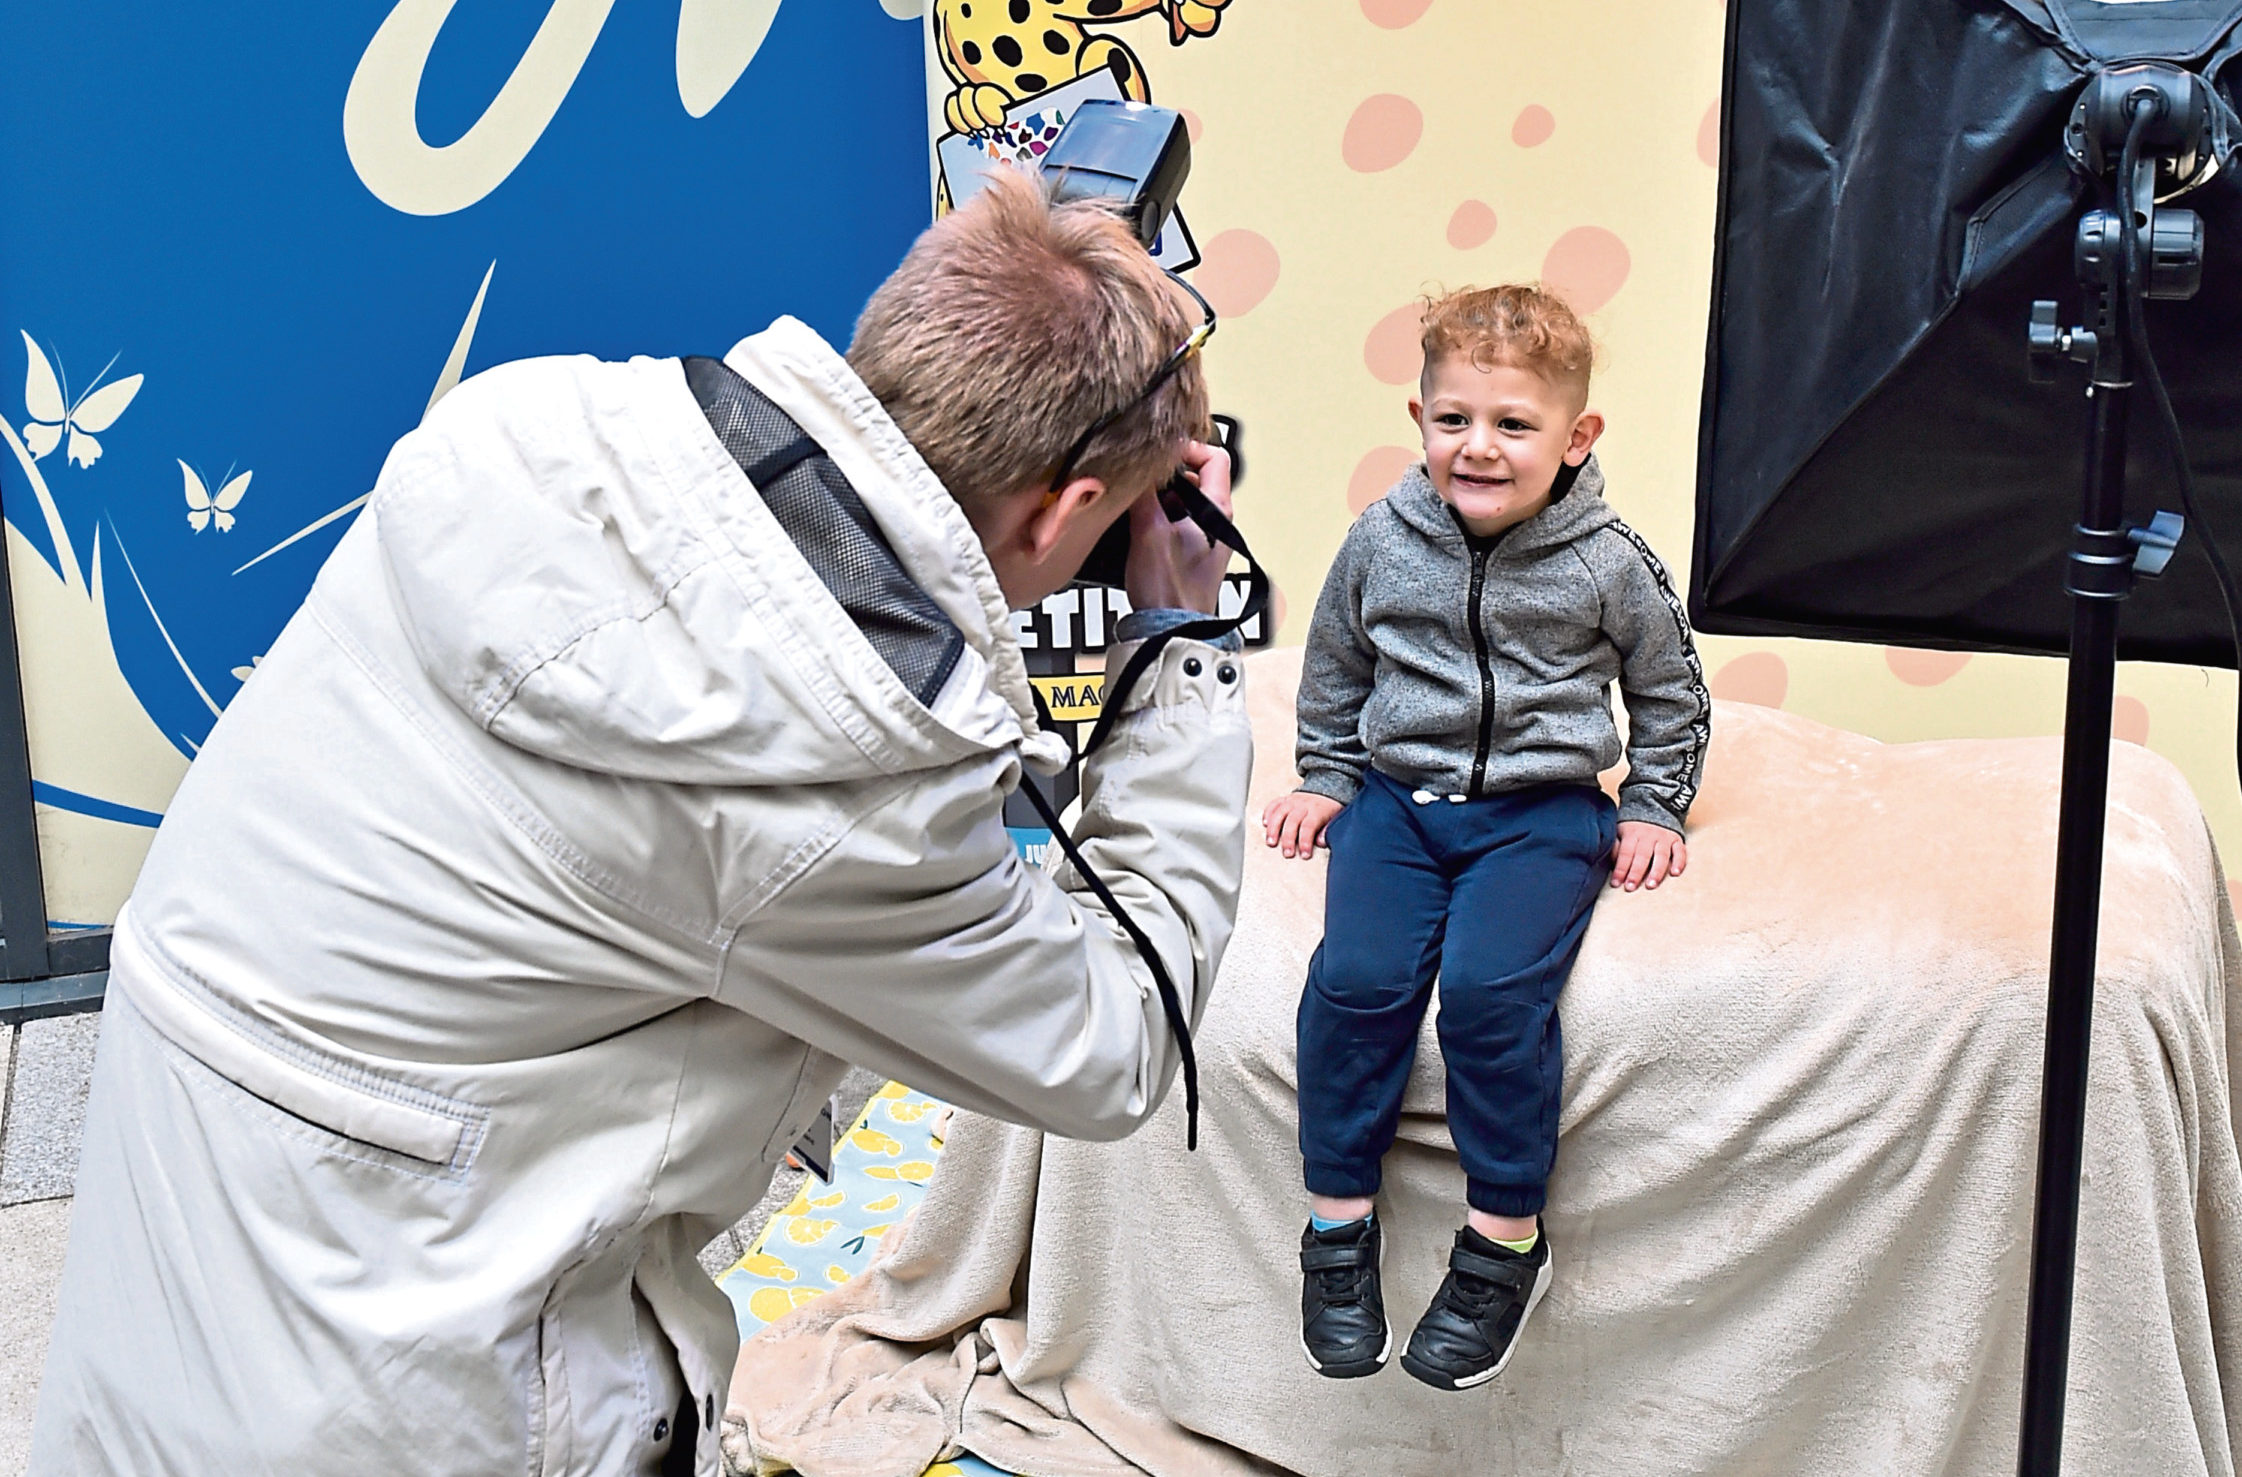 Photographer Lewis Mackland with Logan Tuck, 3